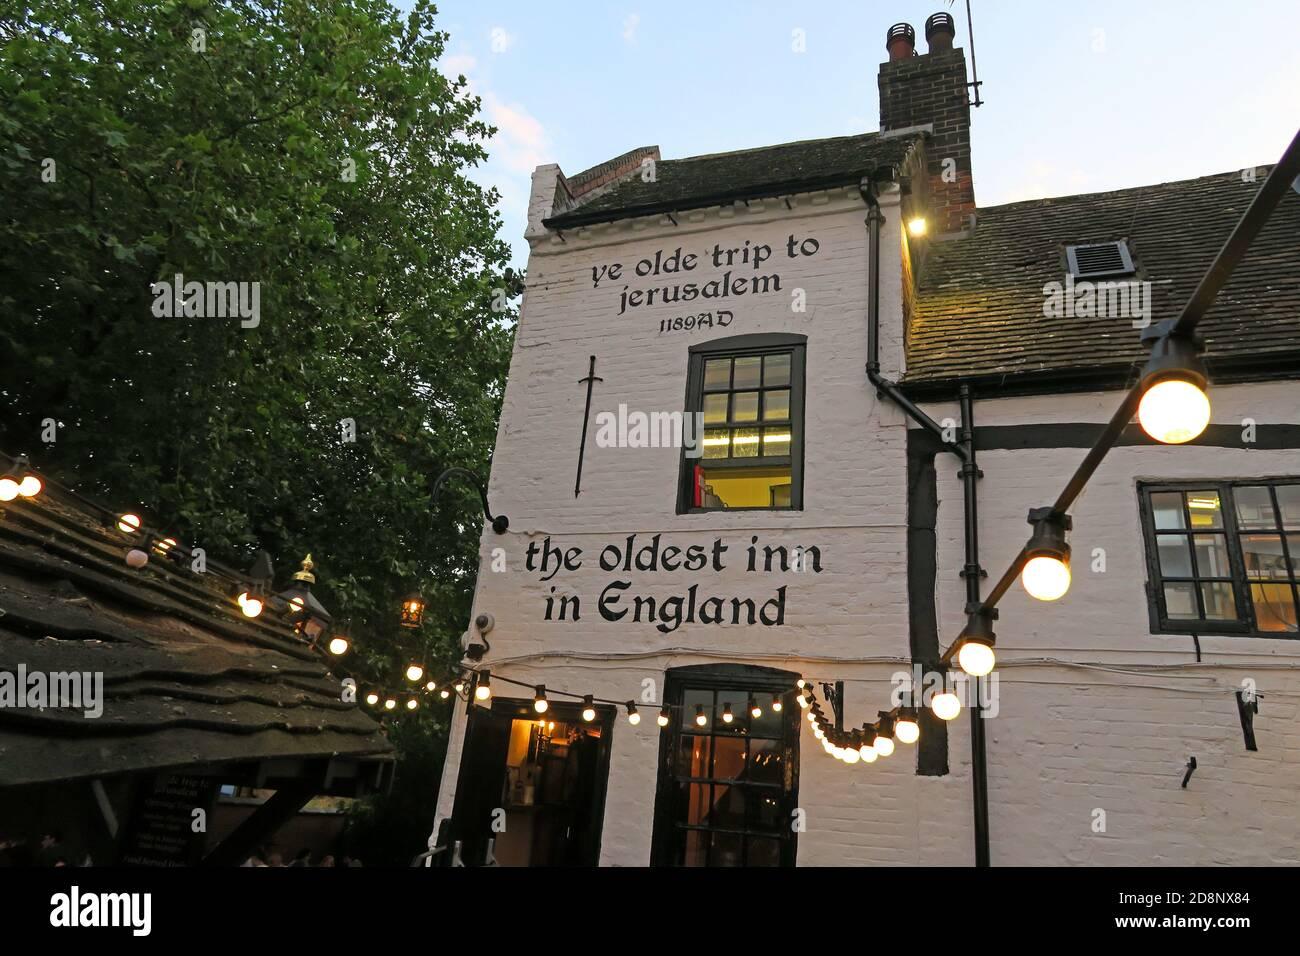 HotpixUK,@HotpixUK,GoTonySmith,UK,England,Great Britain,GB,Nottingham,pub,bar,CAMRA,listed building,oldest bar,old,historic,dusk,evening,city centre,Nottingham city centre,Notts,Nottinghamshire,NG1,east Midlands,Oldest Inn In England,medieval,historic building,1189,Castle Rock,Nottingham Castle,brewhouse,1799,The Pilgrim,the Trip,Brew House Yard,Nottingham Castle Brewhouse,lighting,outdoor,outside,lights